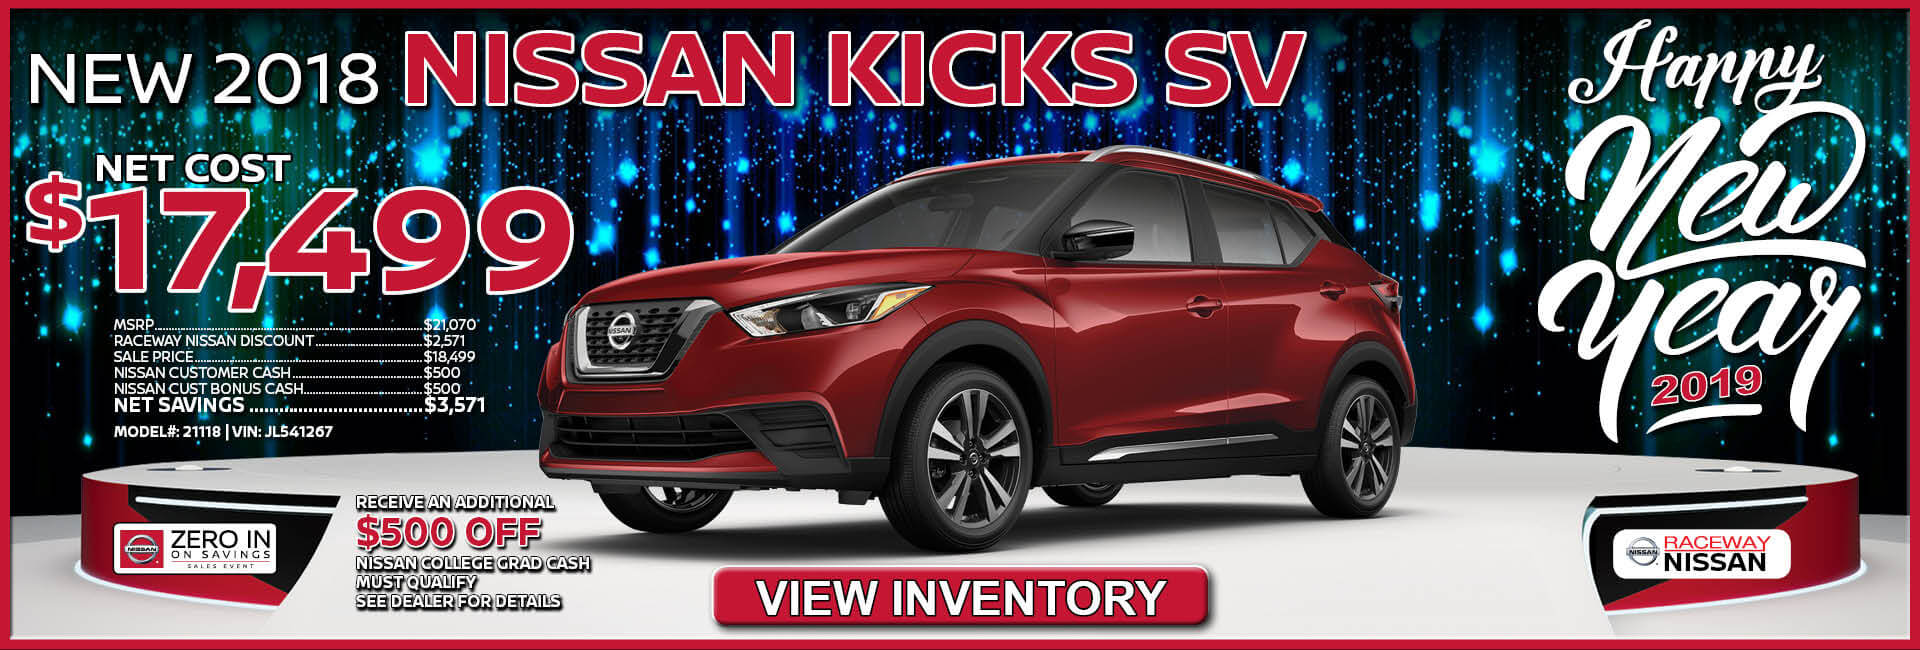 Nissan Kicks $17,499